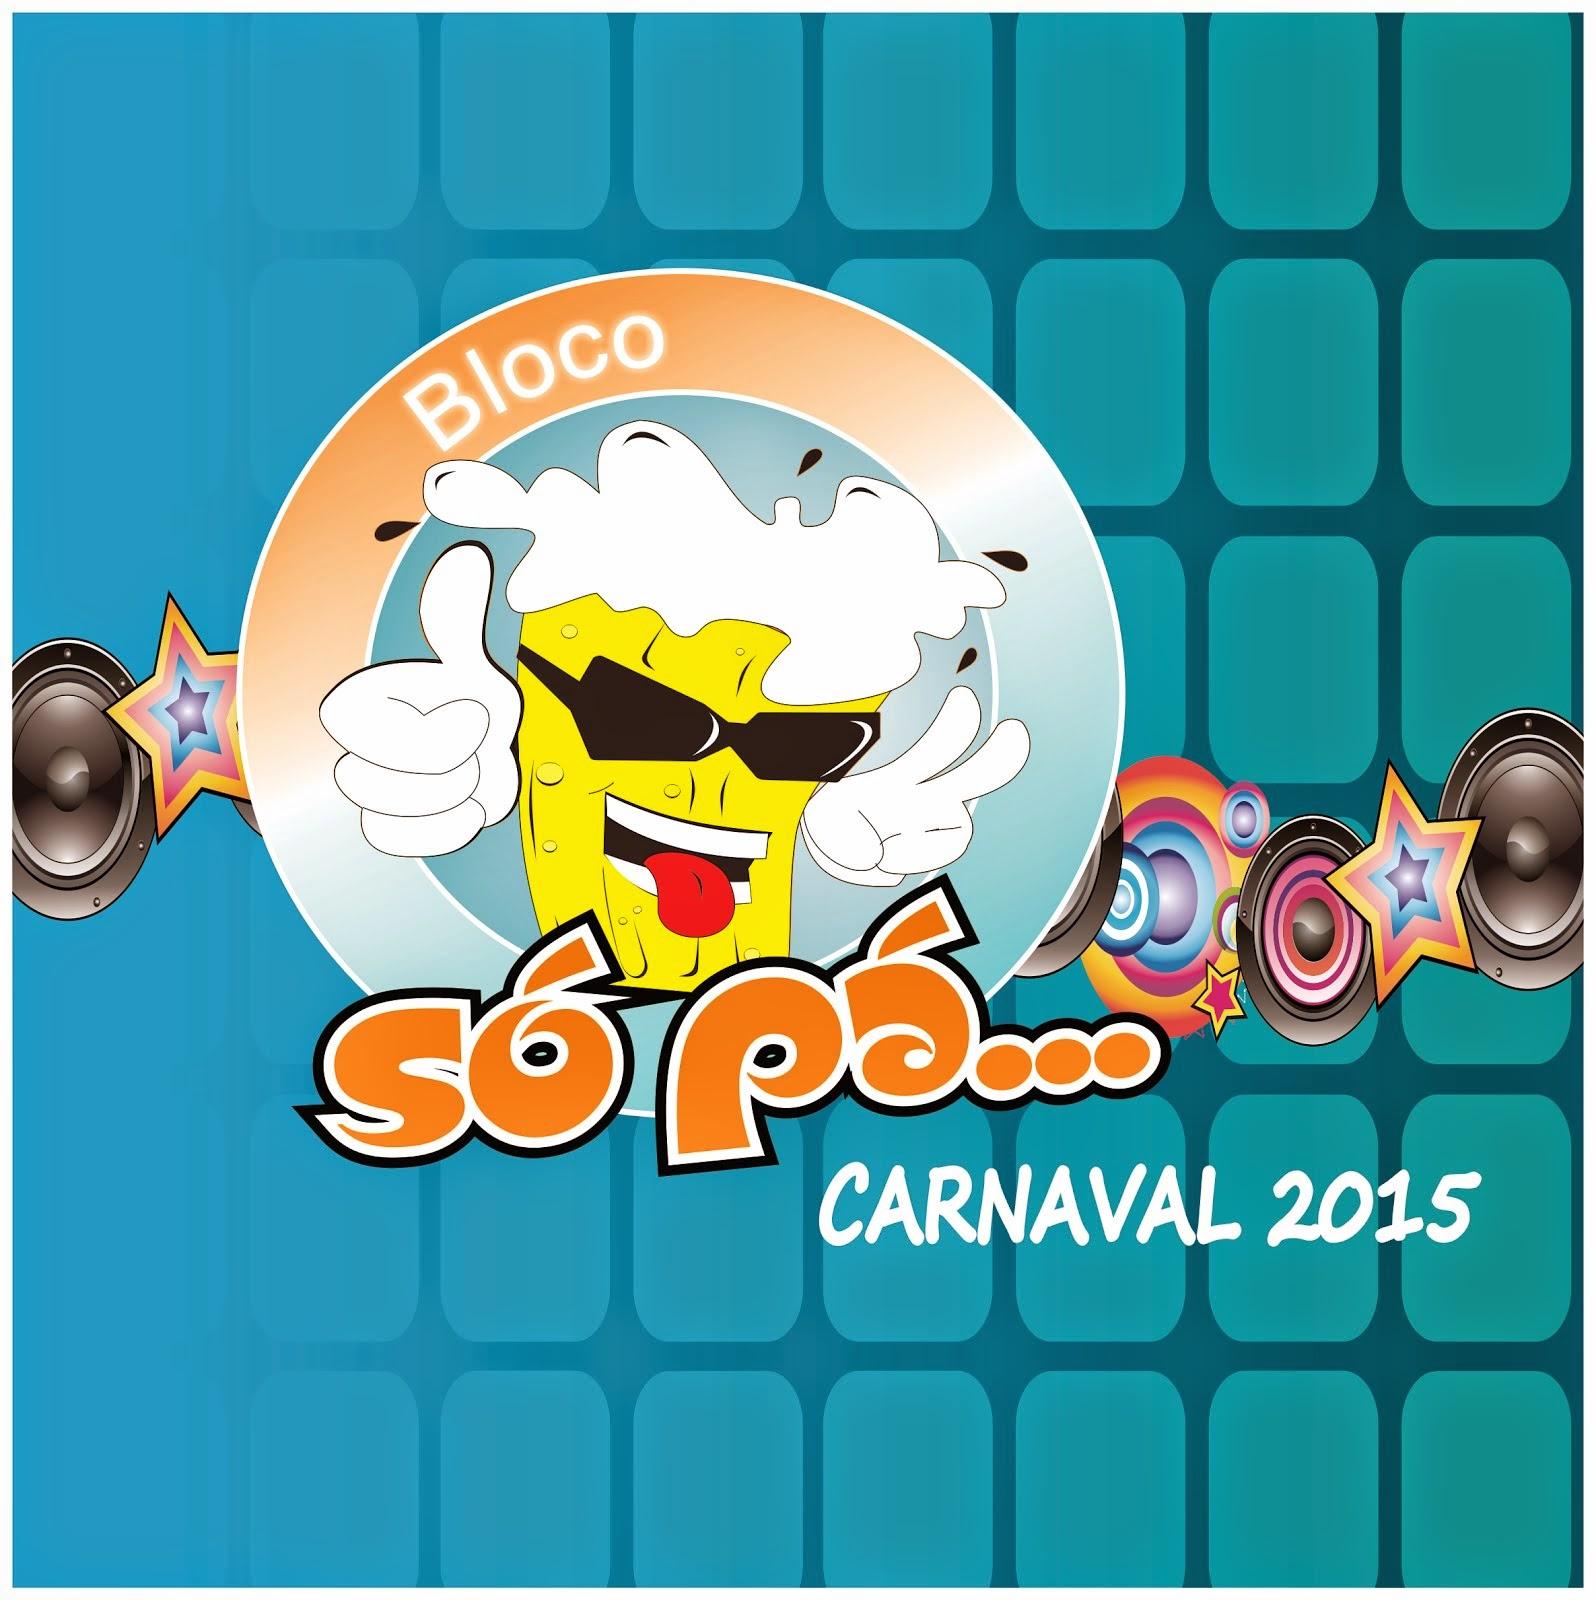 # carnaval 2015